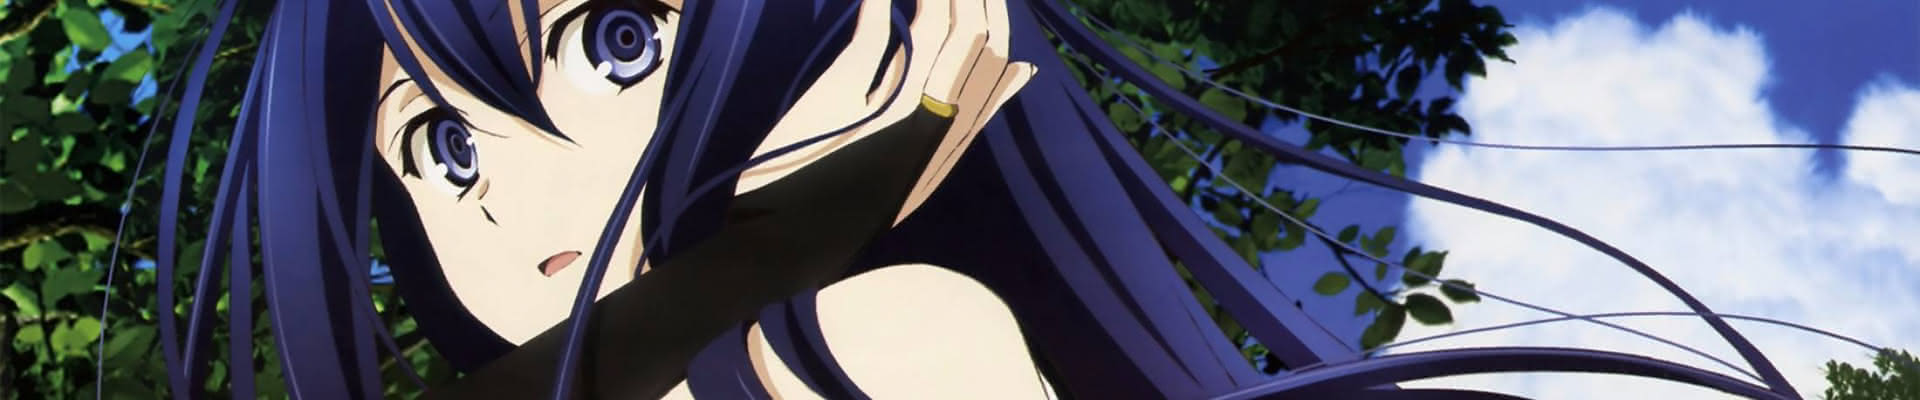 Gokukoku no Brynhildr